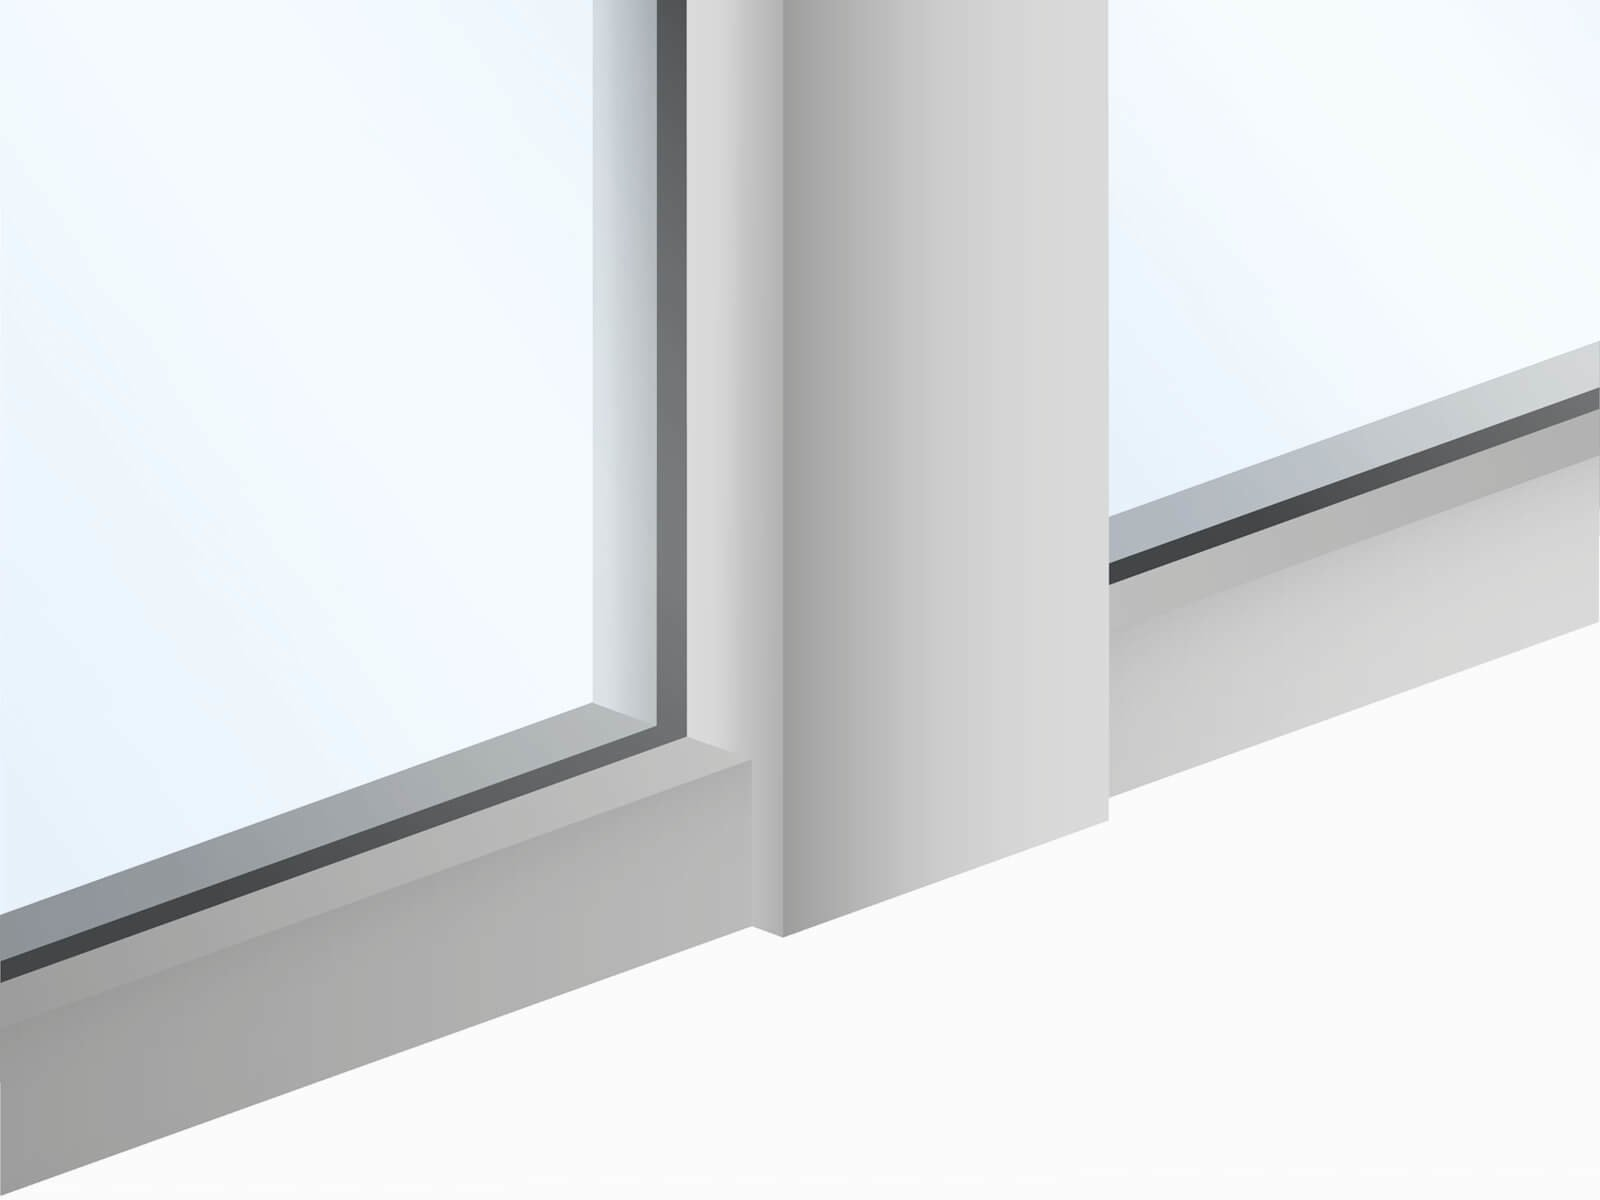 glastrennwand-slim-protect-gerade